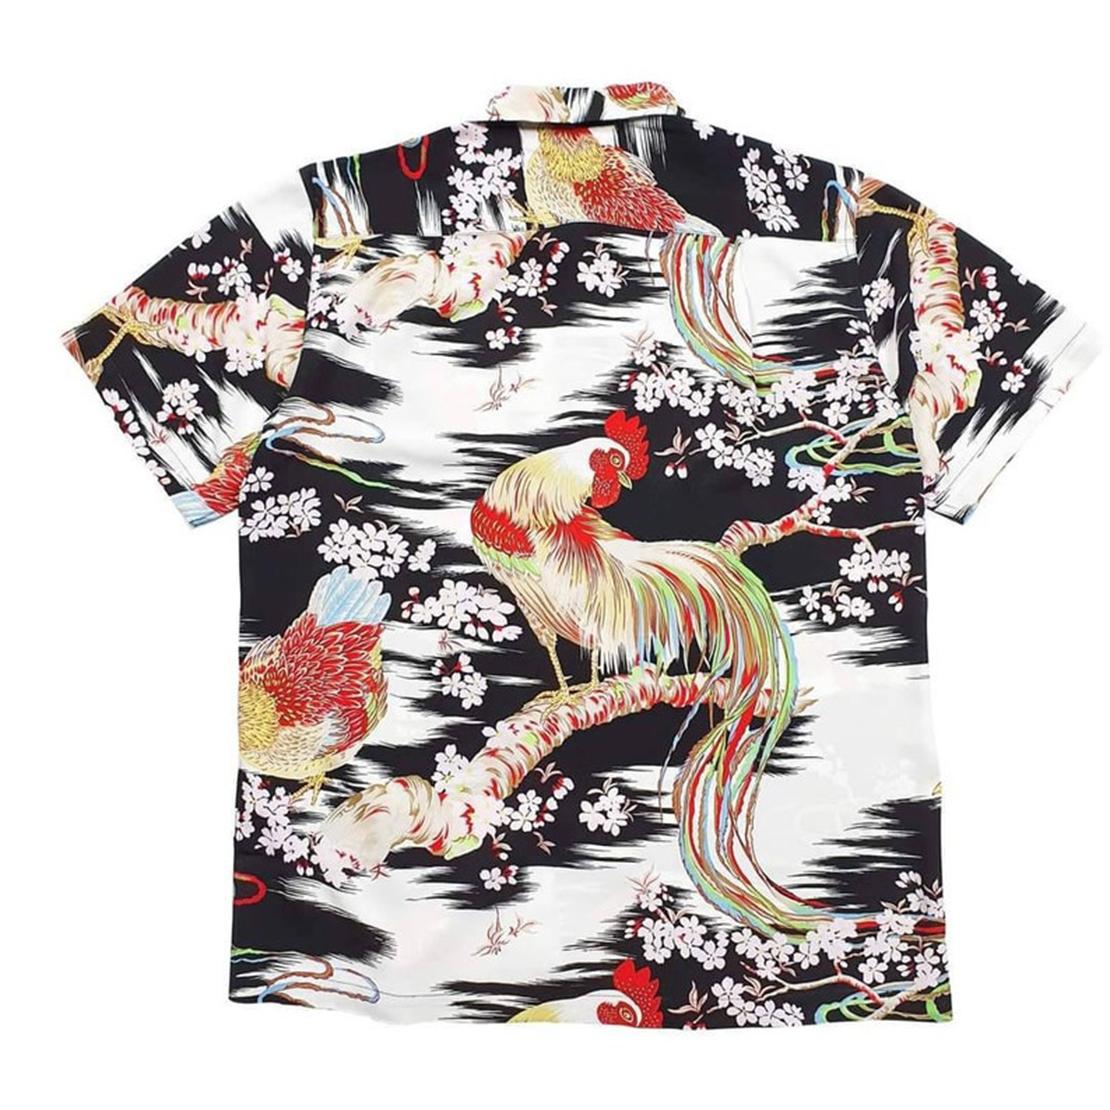 Rayon Crepe Japanese Chicken Onaga Dori Hawaiian Shirt